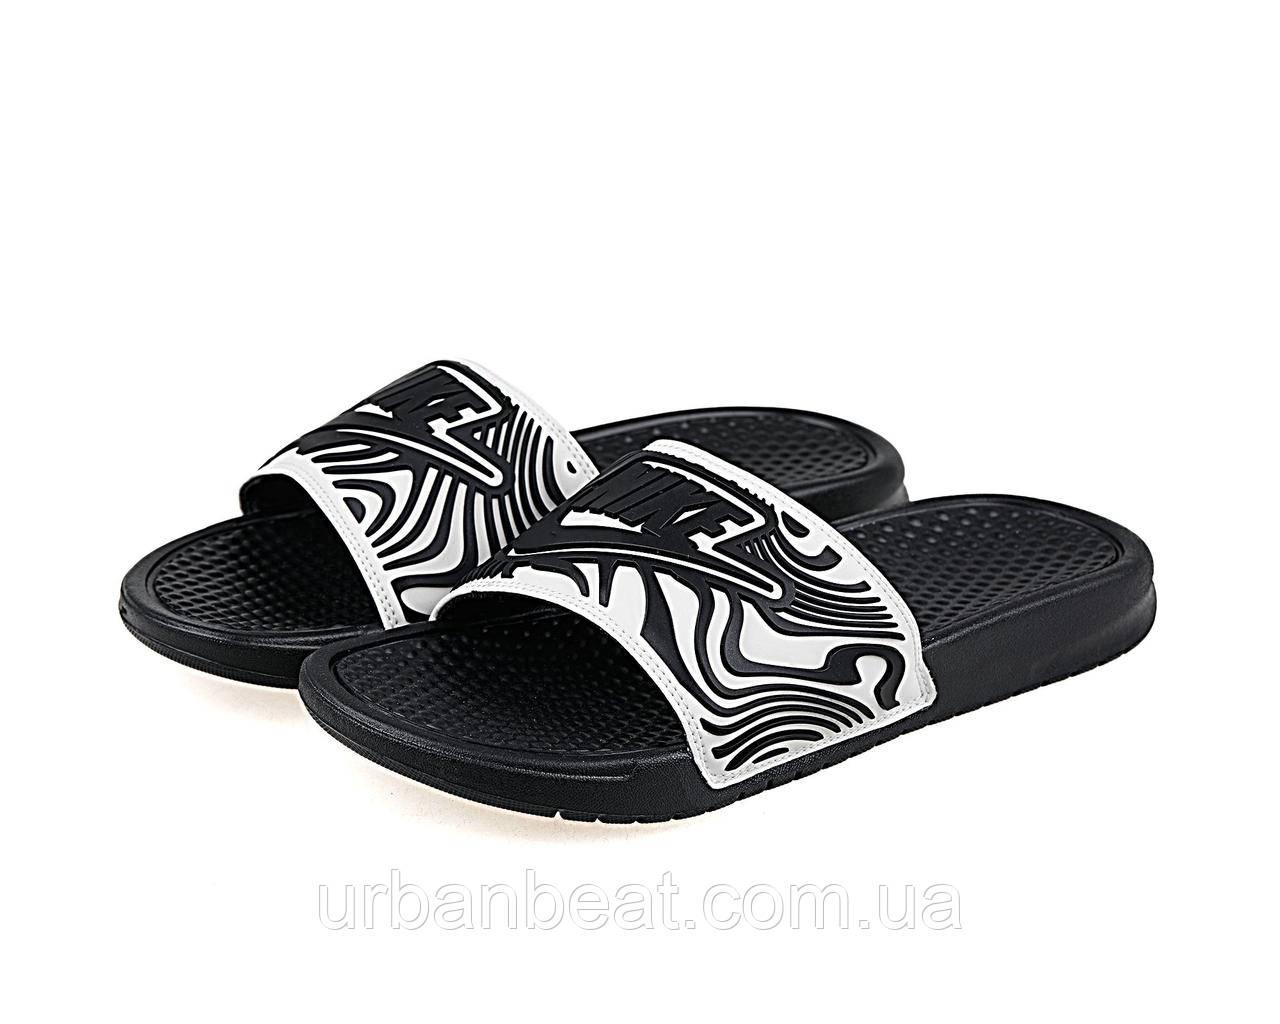 22c5568e Мужские сланцы Nike Benassi JDI Se Оригинал, цена 950 грн., купить в ...